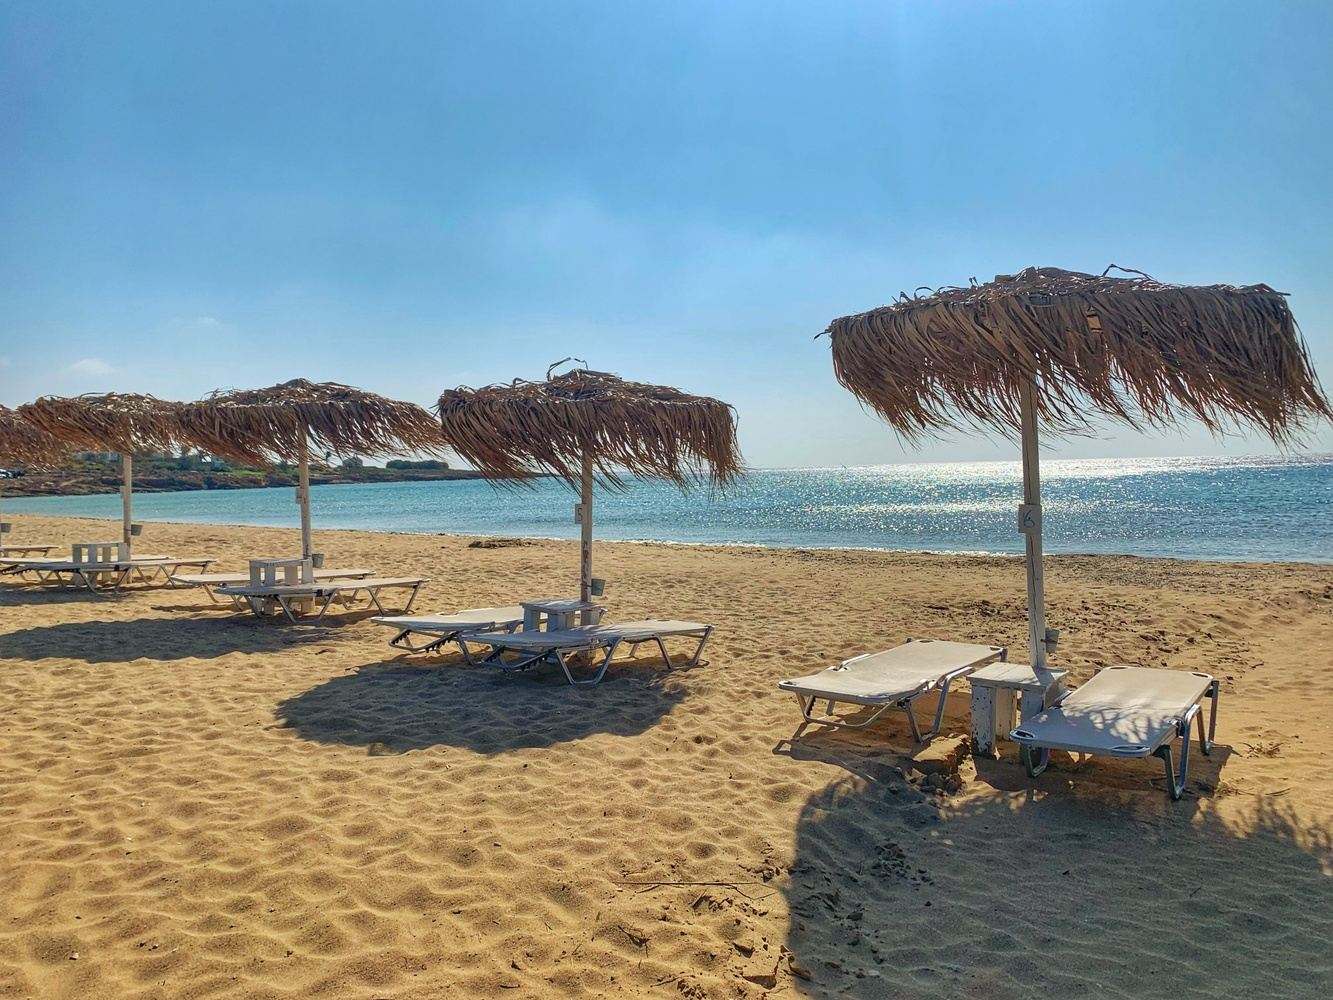 Yoga Retreat in Paros, Greece May 15-22